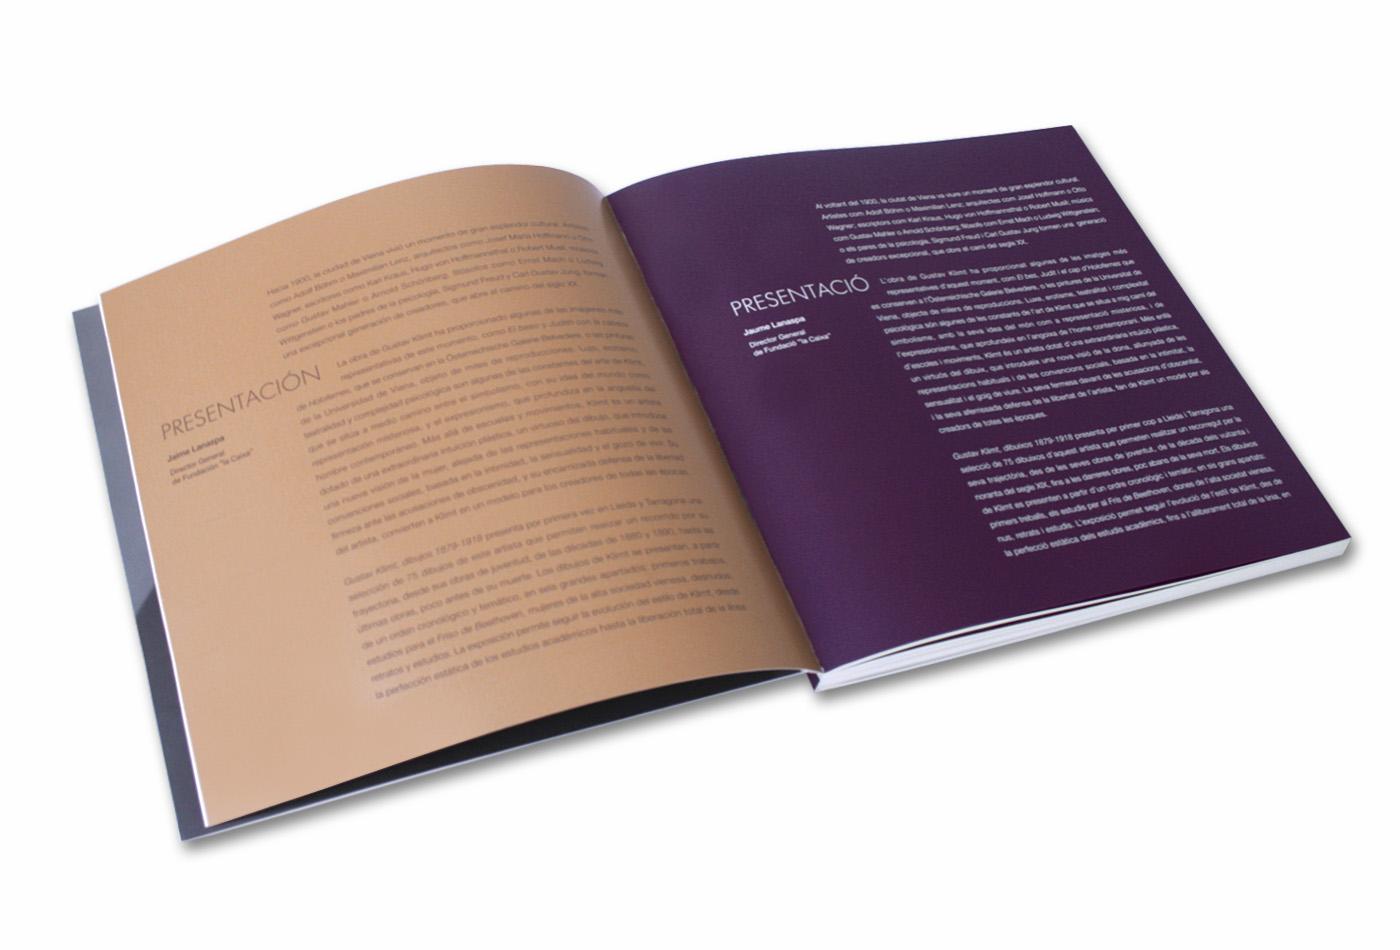 fundacio-la-caixa-gustav-klimt-editorial-creartiva